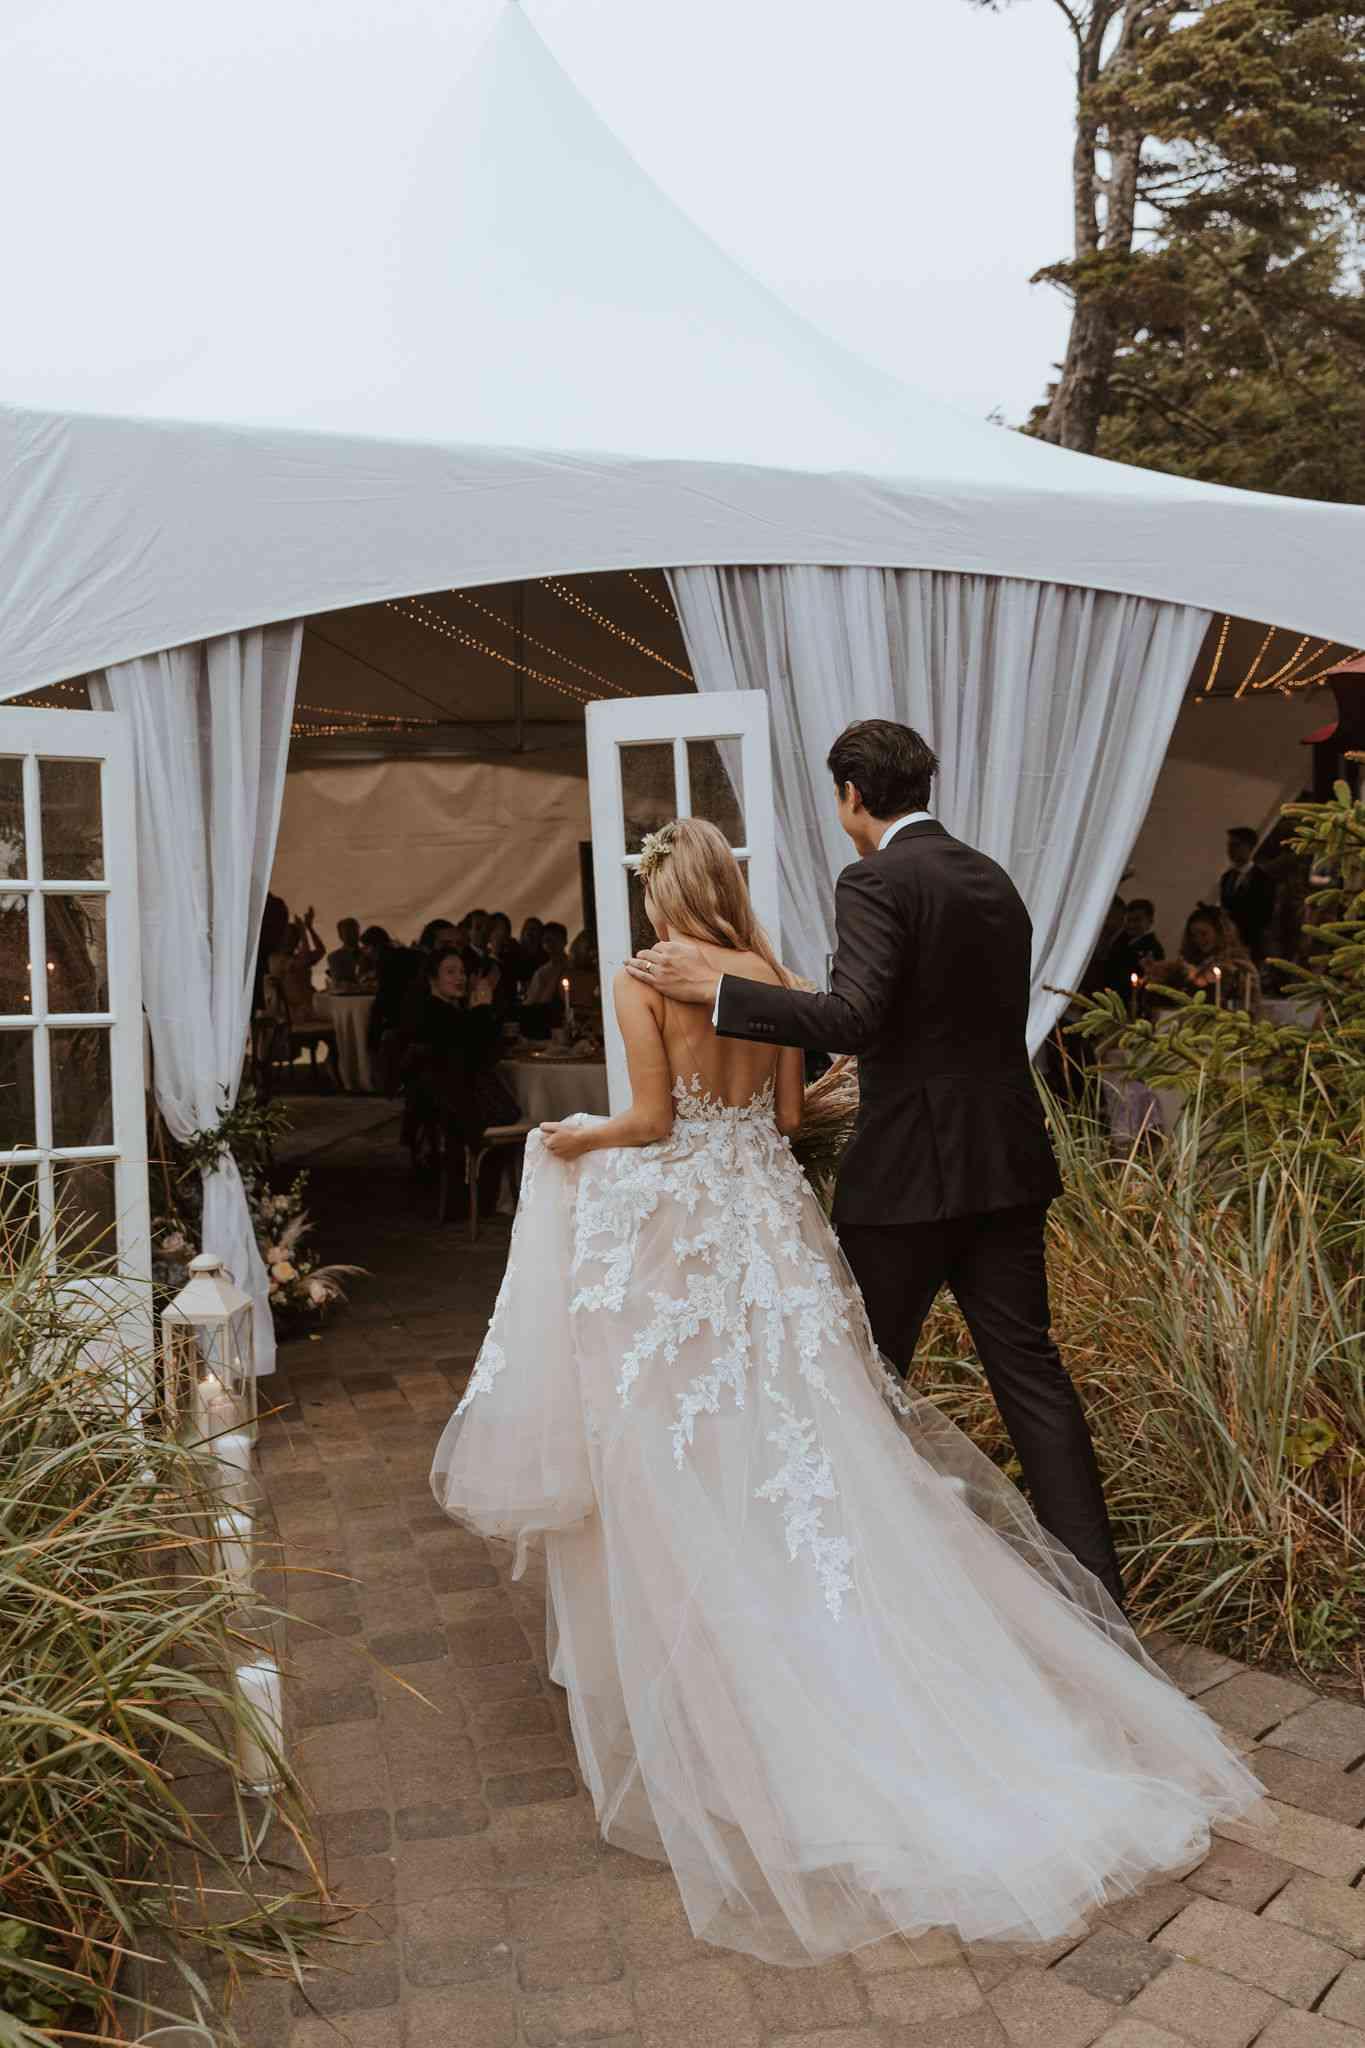 couple entering tent